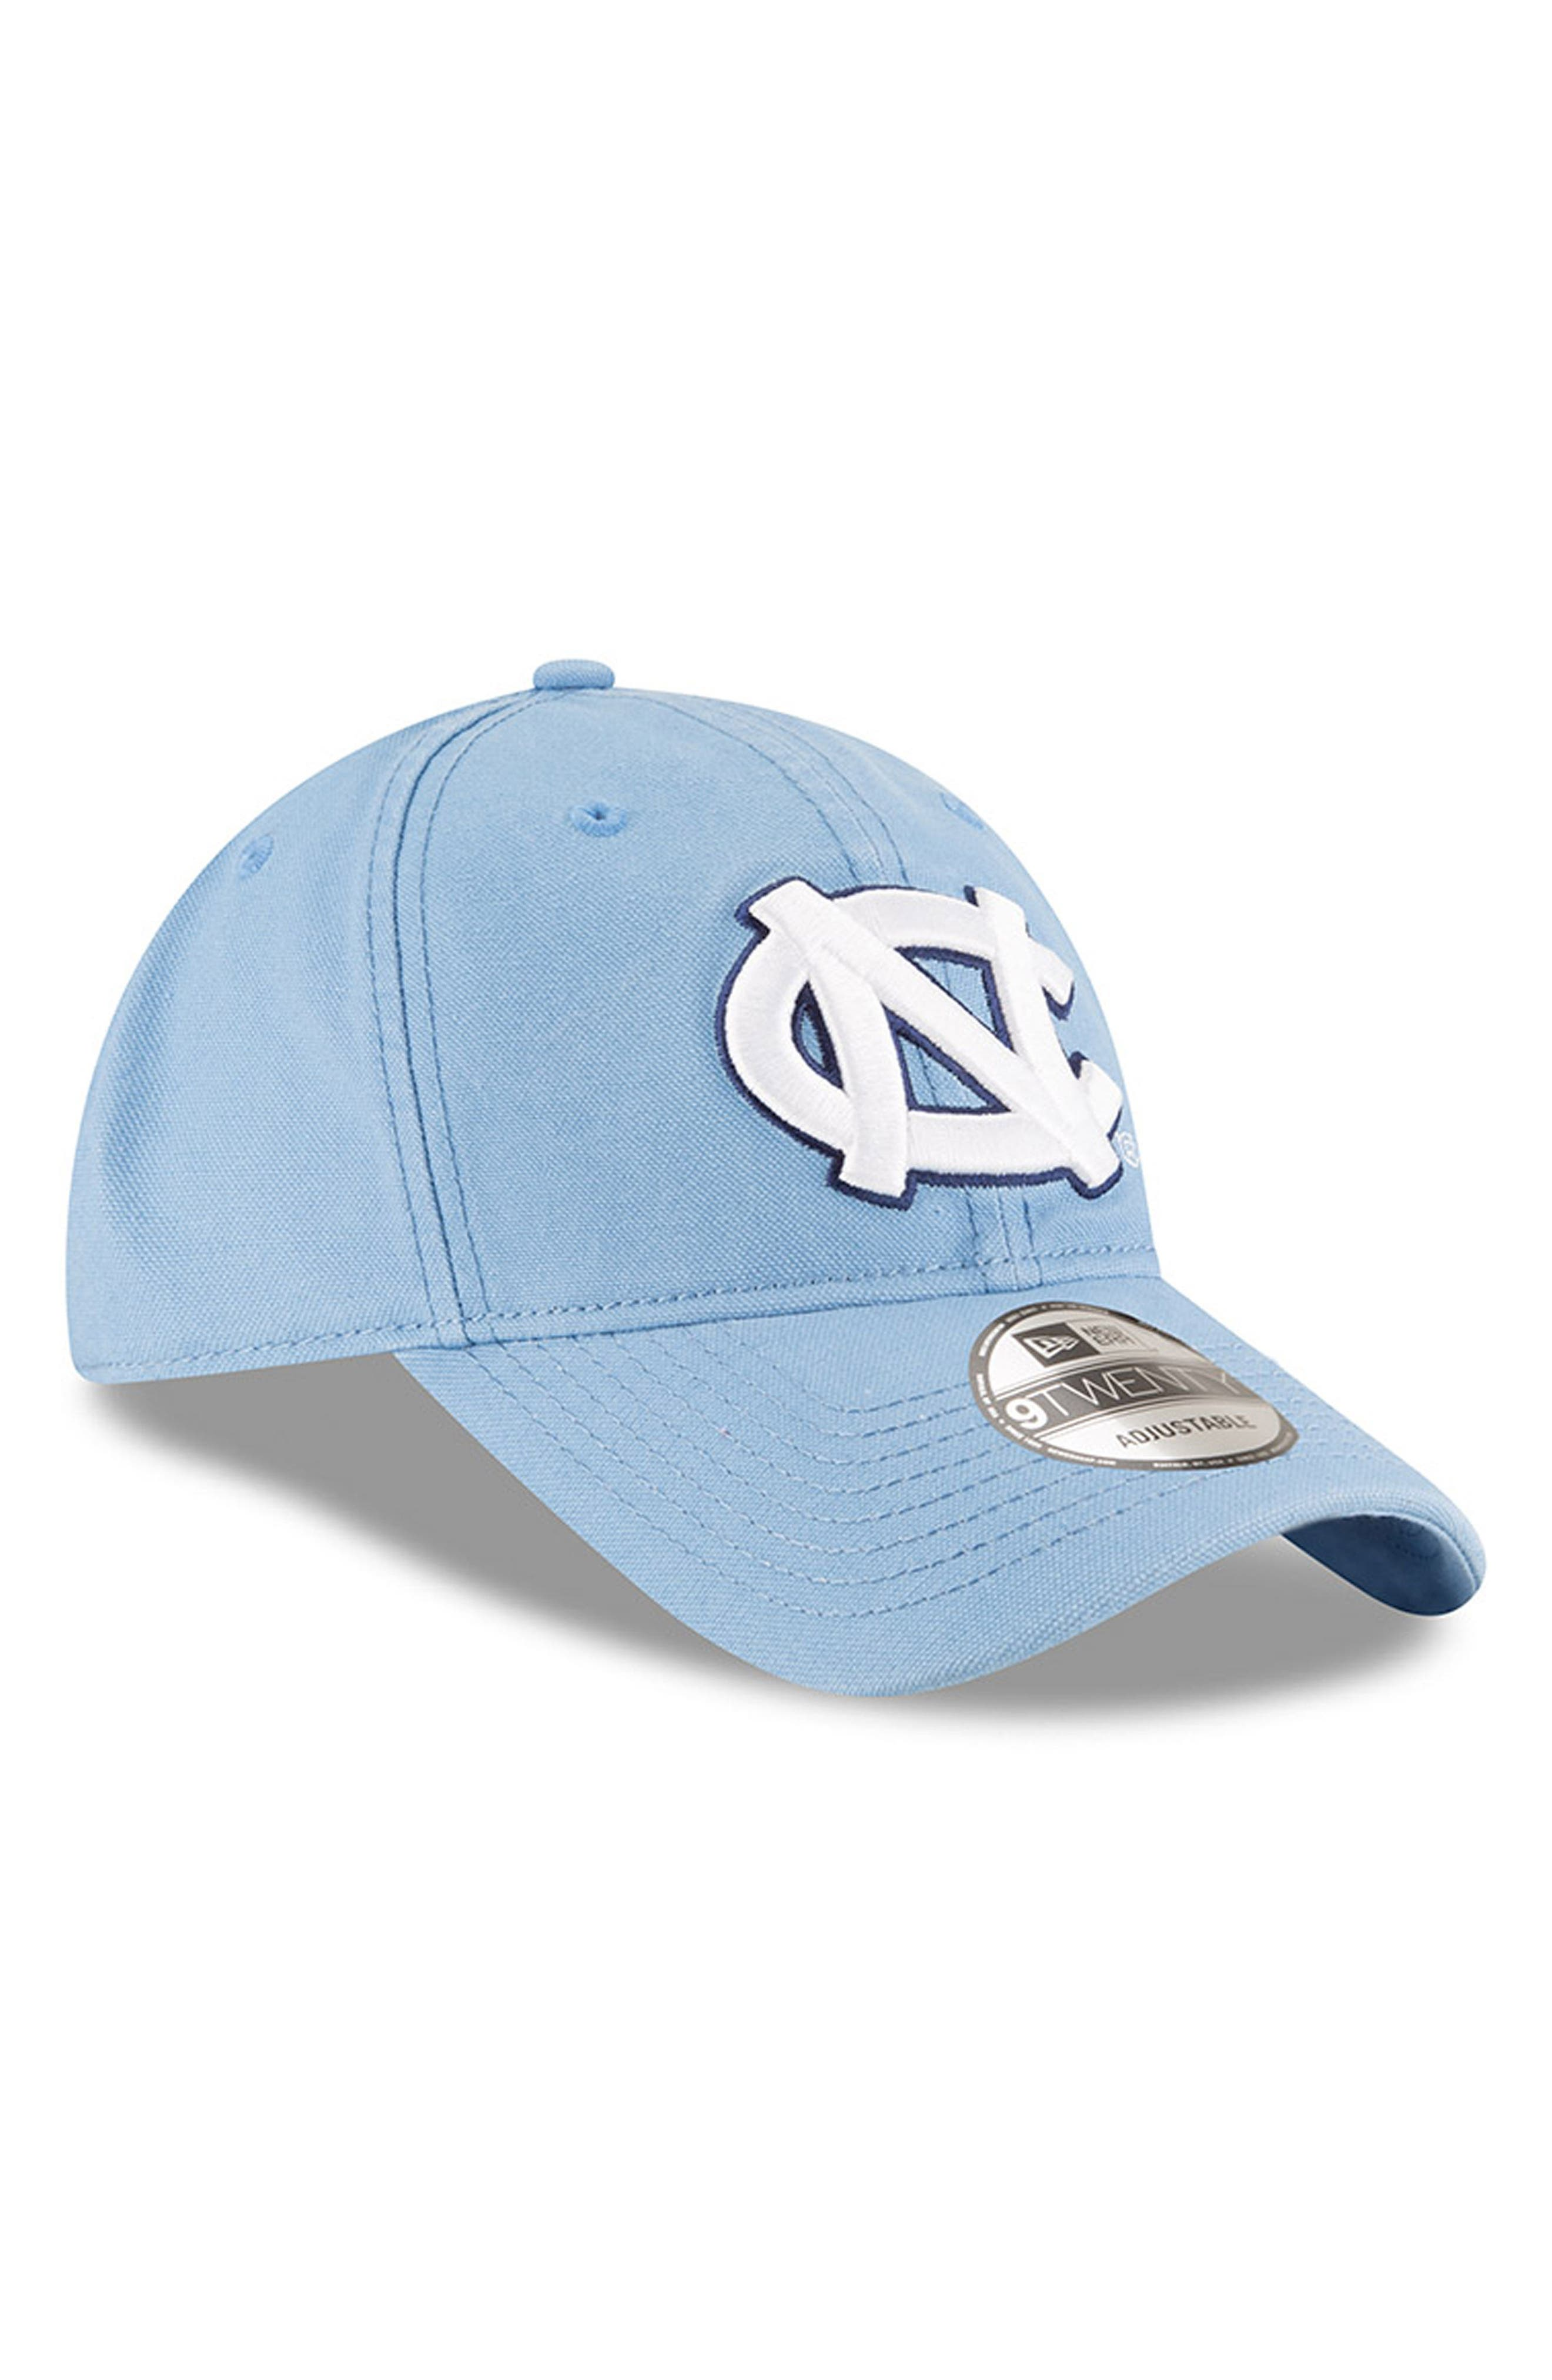 New Era Collegiate Core Classic - North Carolina Tar Heels Baseball Cap,                             Alternate thumbnail 4, color,                             450